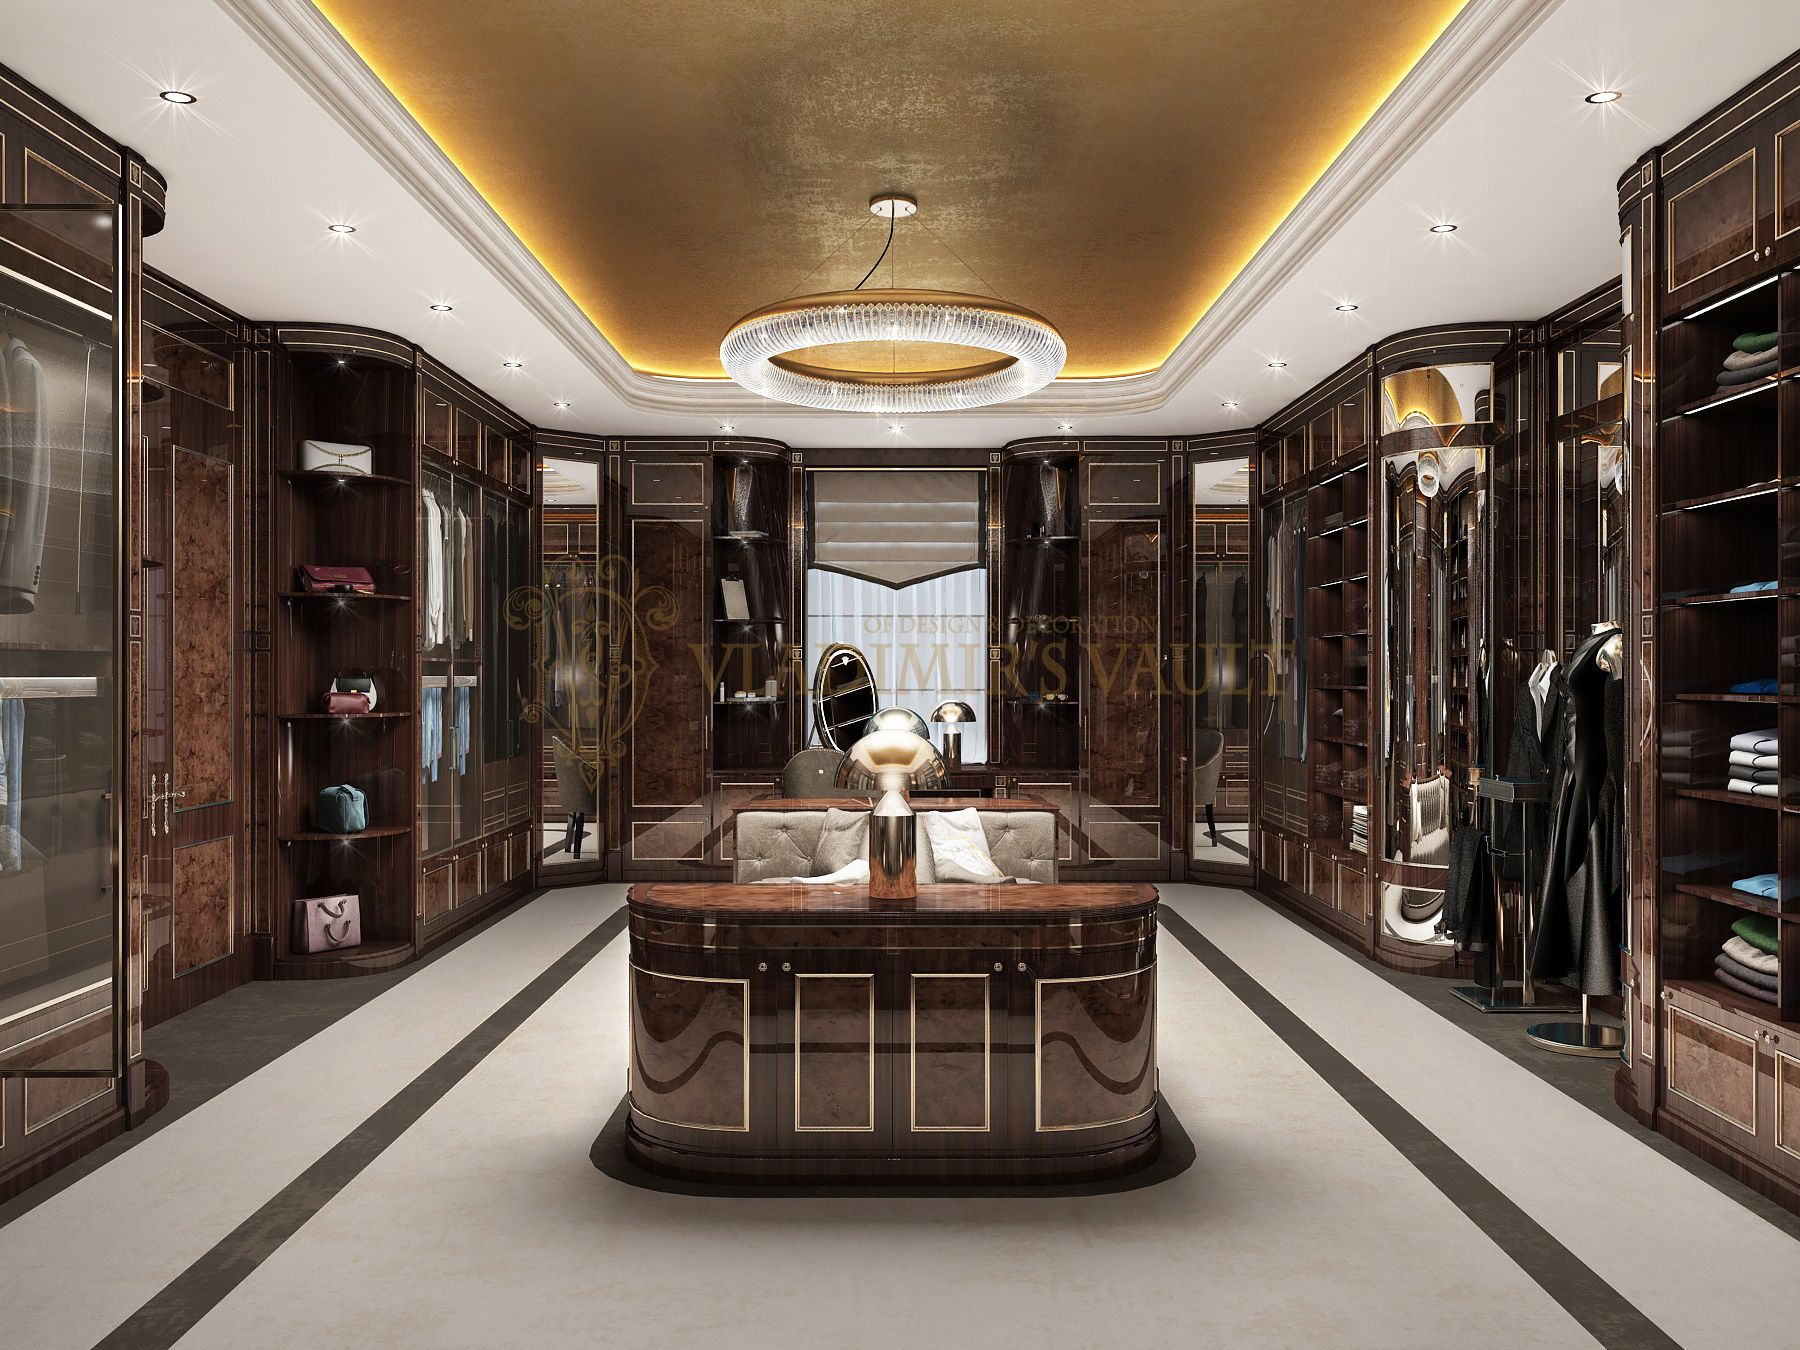 Luxury Wordrobe By Vladimirs Vault Design Interiordesign Interior Luxuryfurniture Luxuryh In 2020 Luxury Wardrobe Luxury Interior Design Luxury Interior